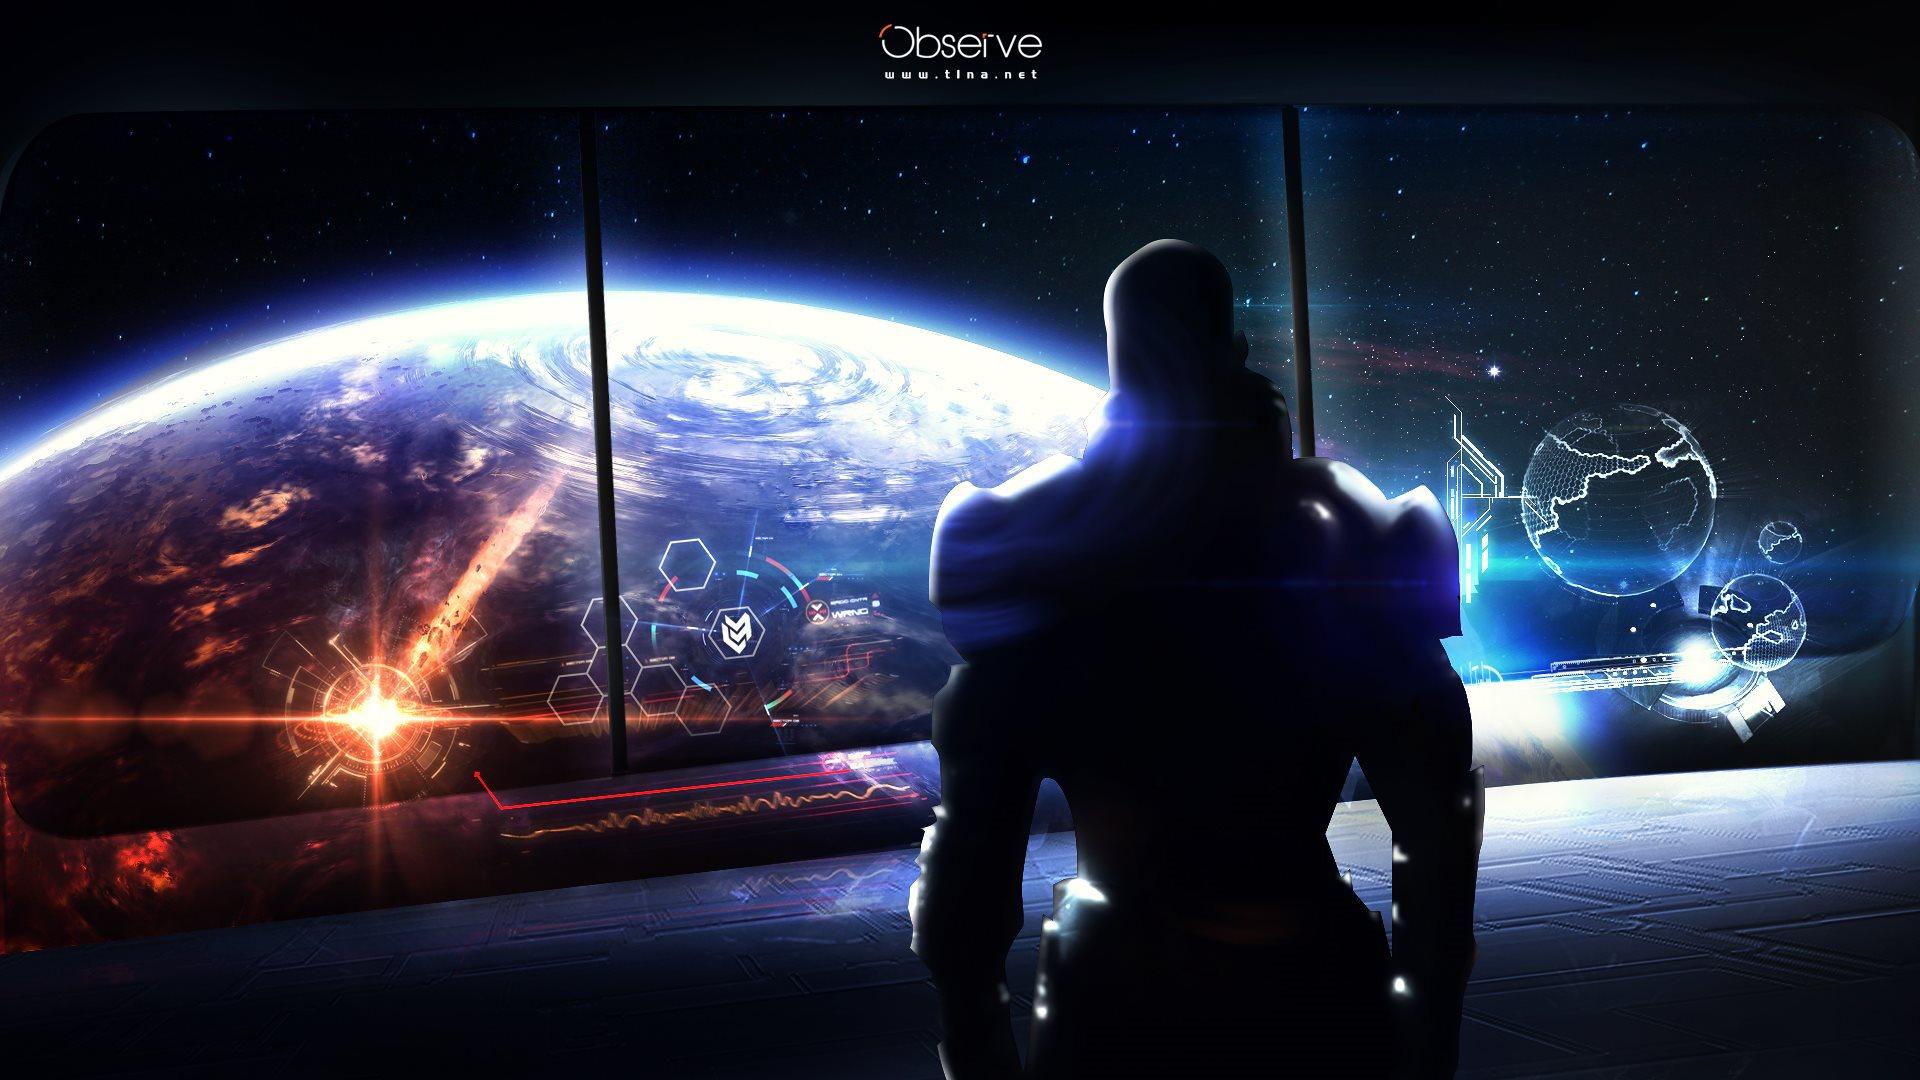 Free Download Mass Effect World Of Warcraft Fan Art Wallpapers Hd